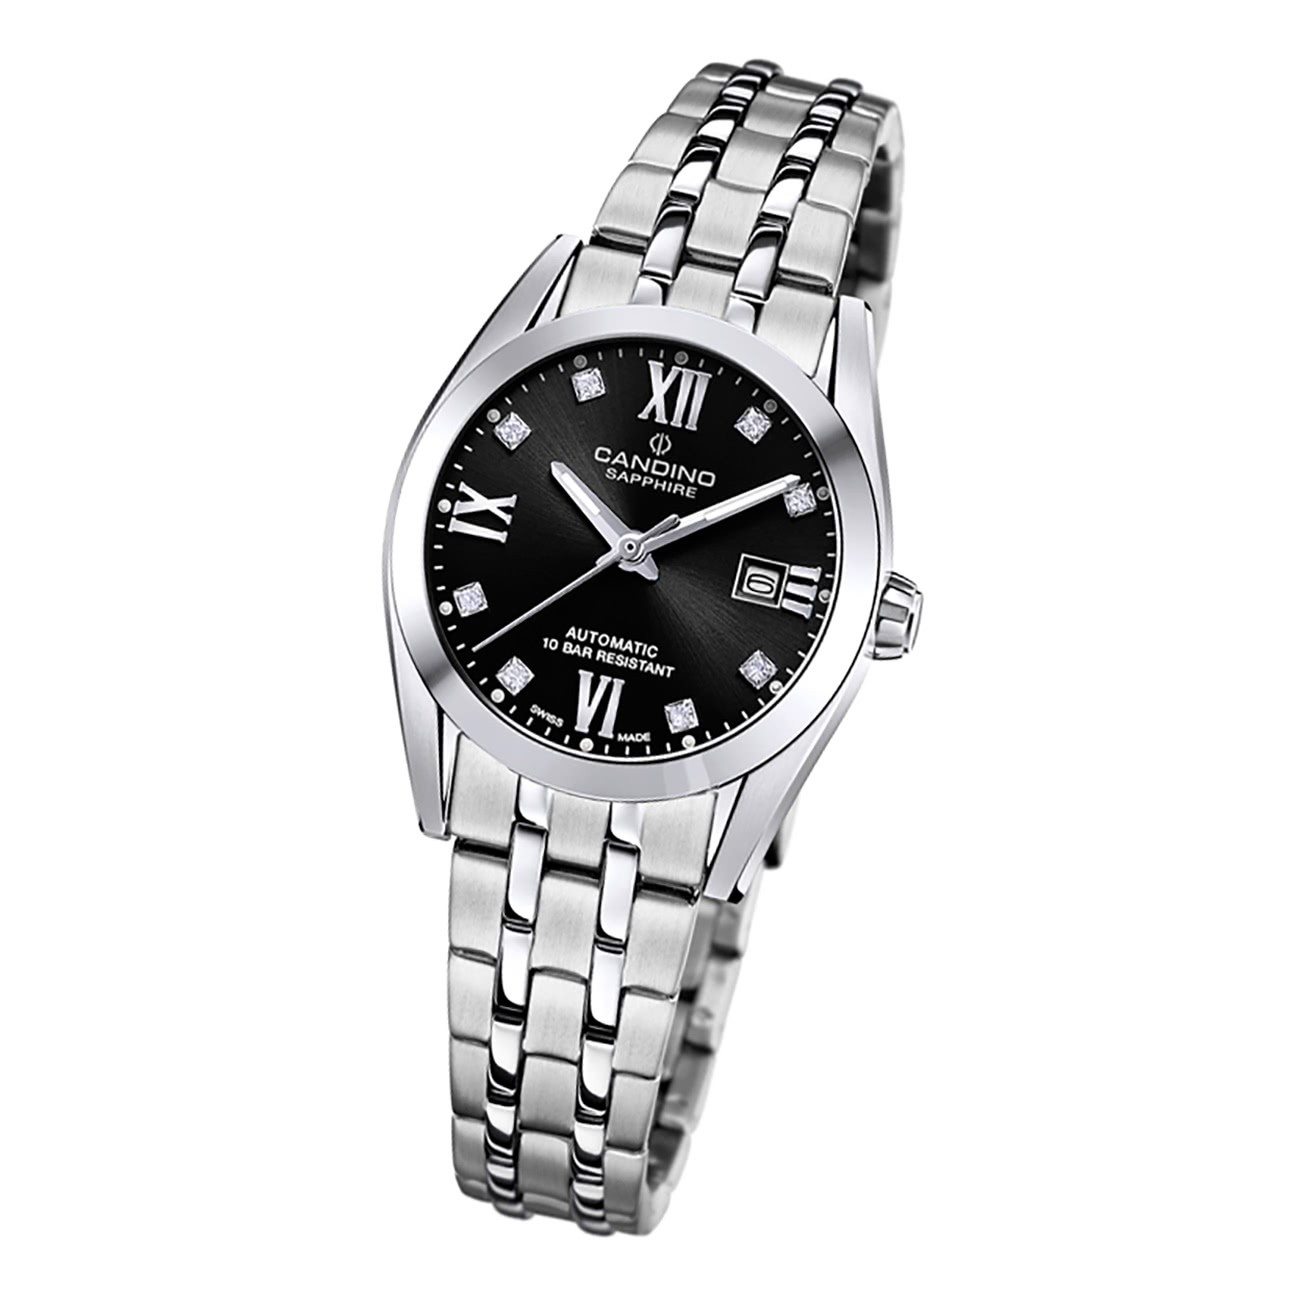 Candino Damen Armbanduhr Automatik C4703/3 Analog Edelstahl silber UC4703/3